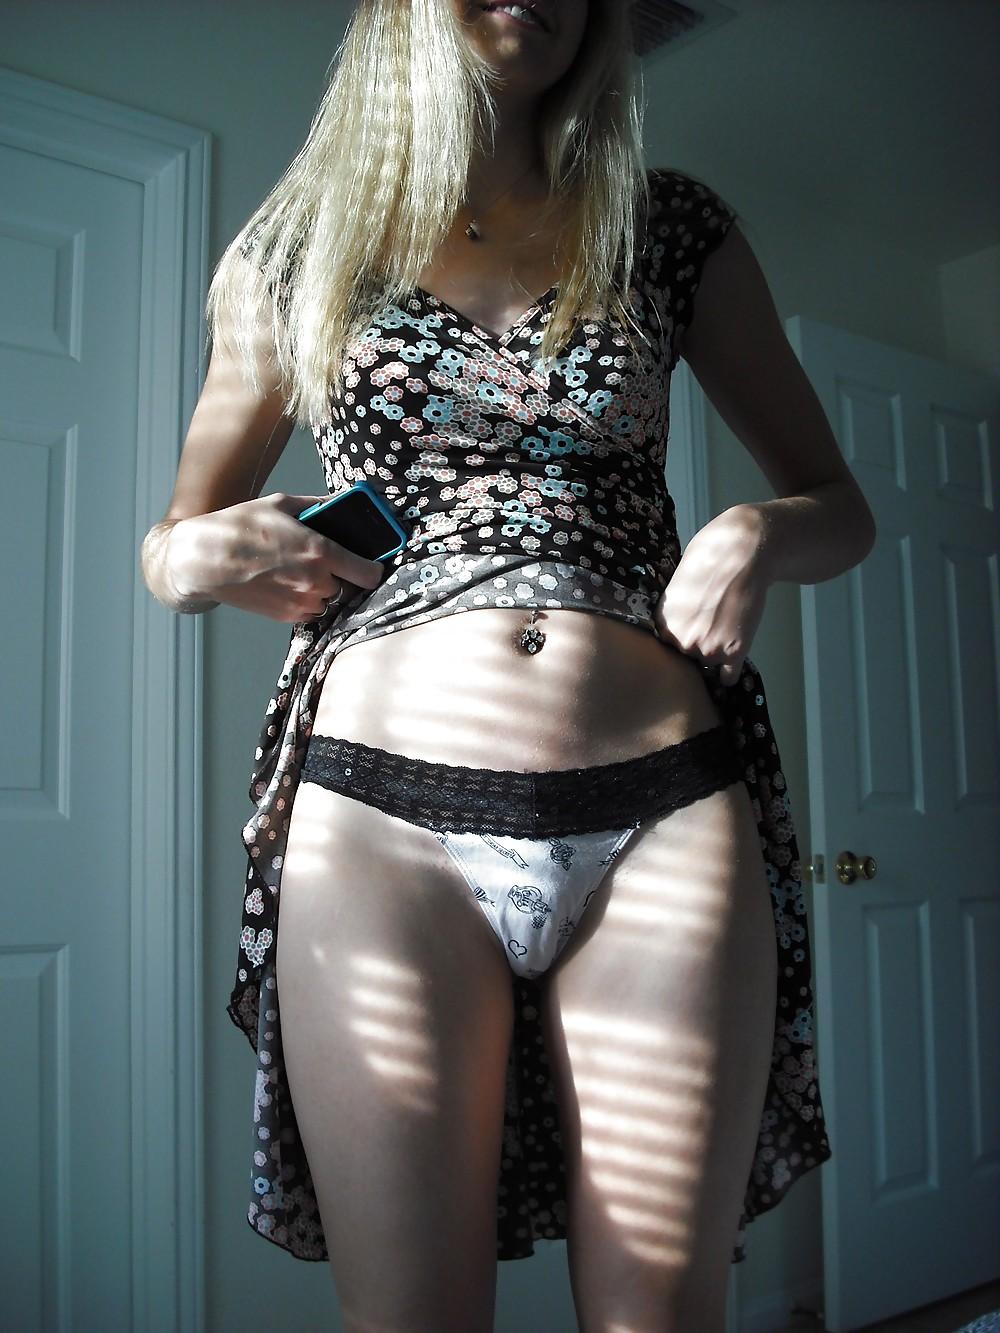 Beautilful california amateurs v14 nylon slips and panties - 2 part 3